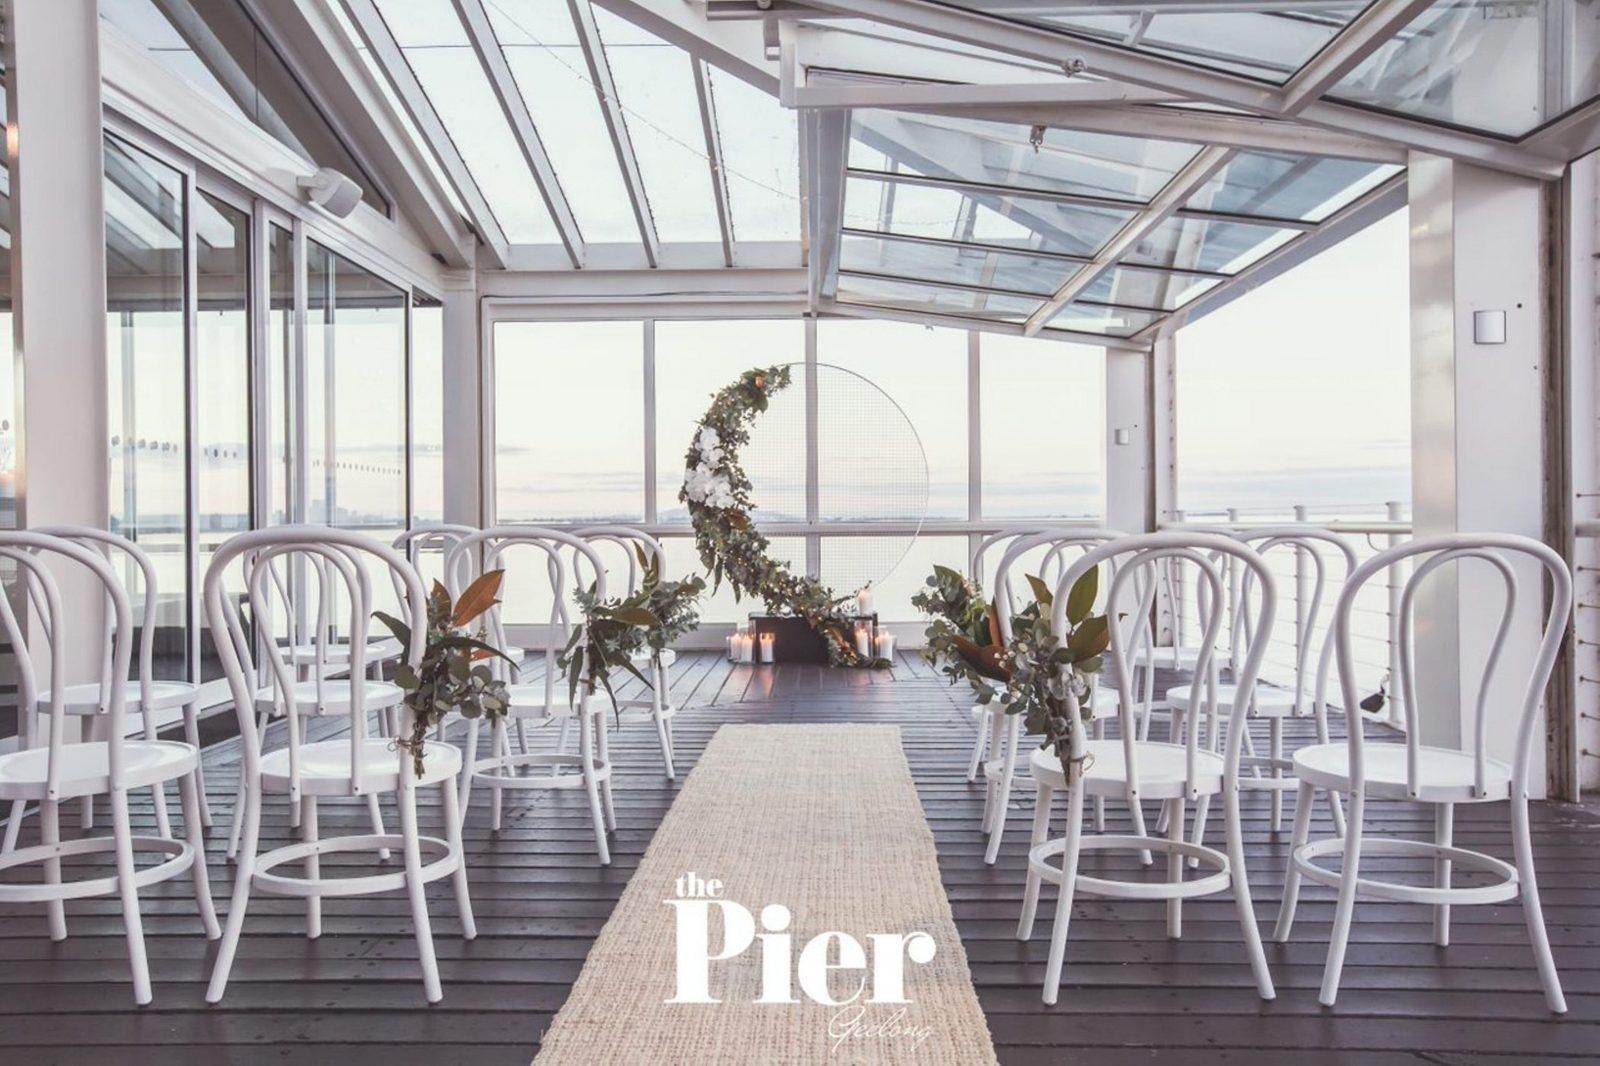 The Pier Entrance space